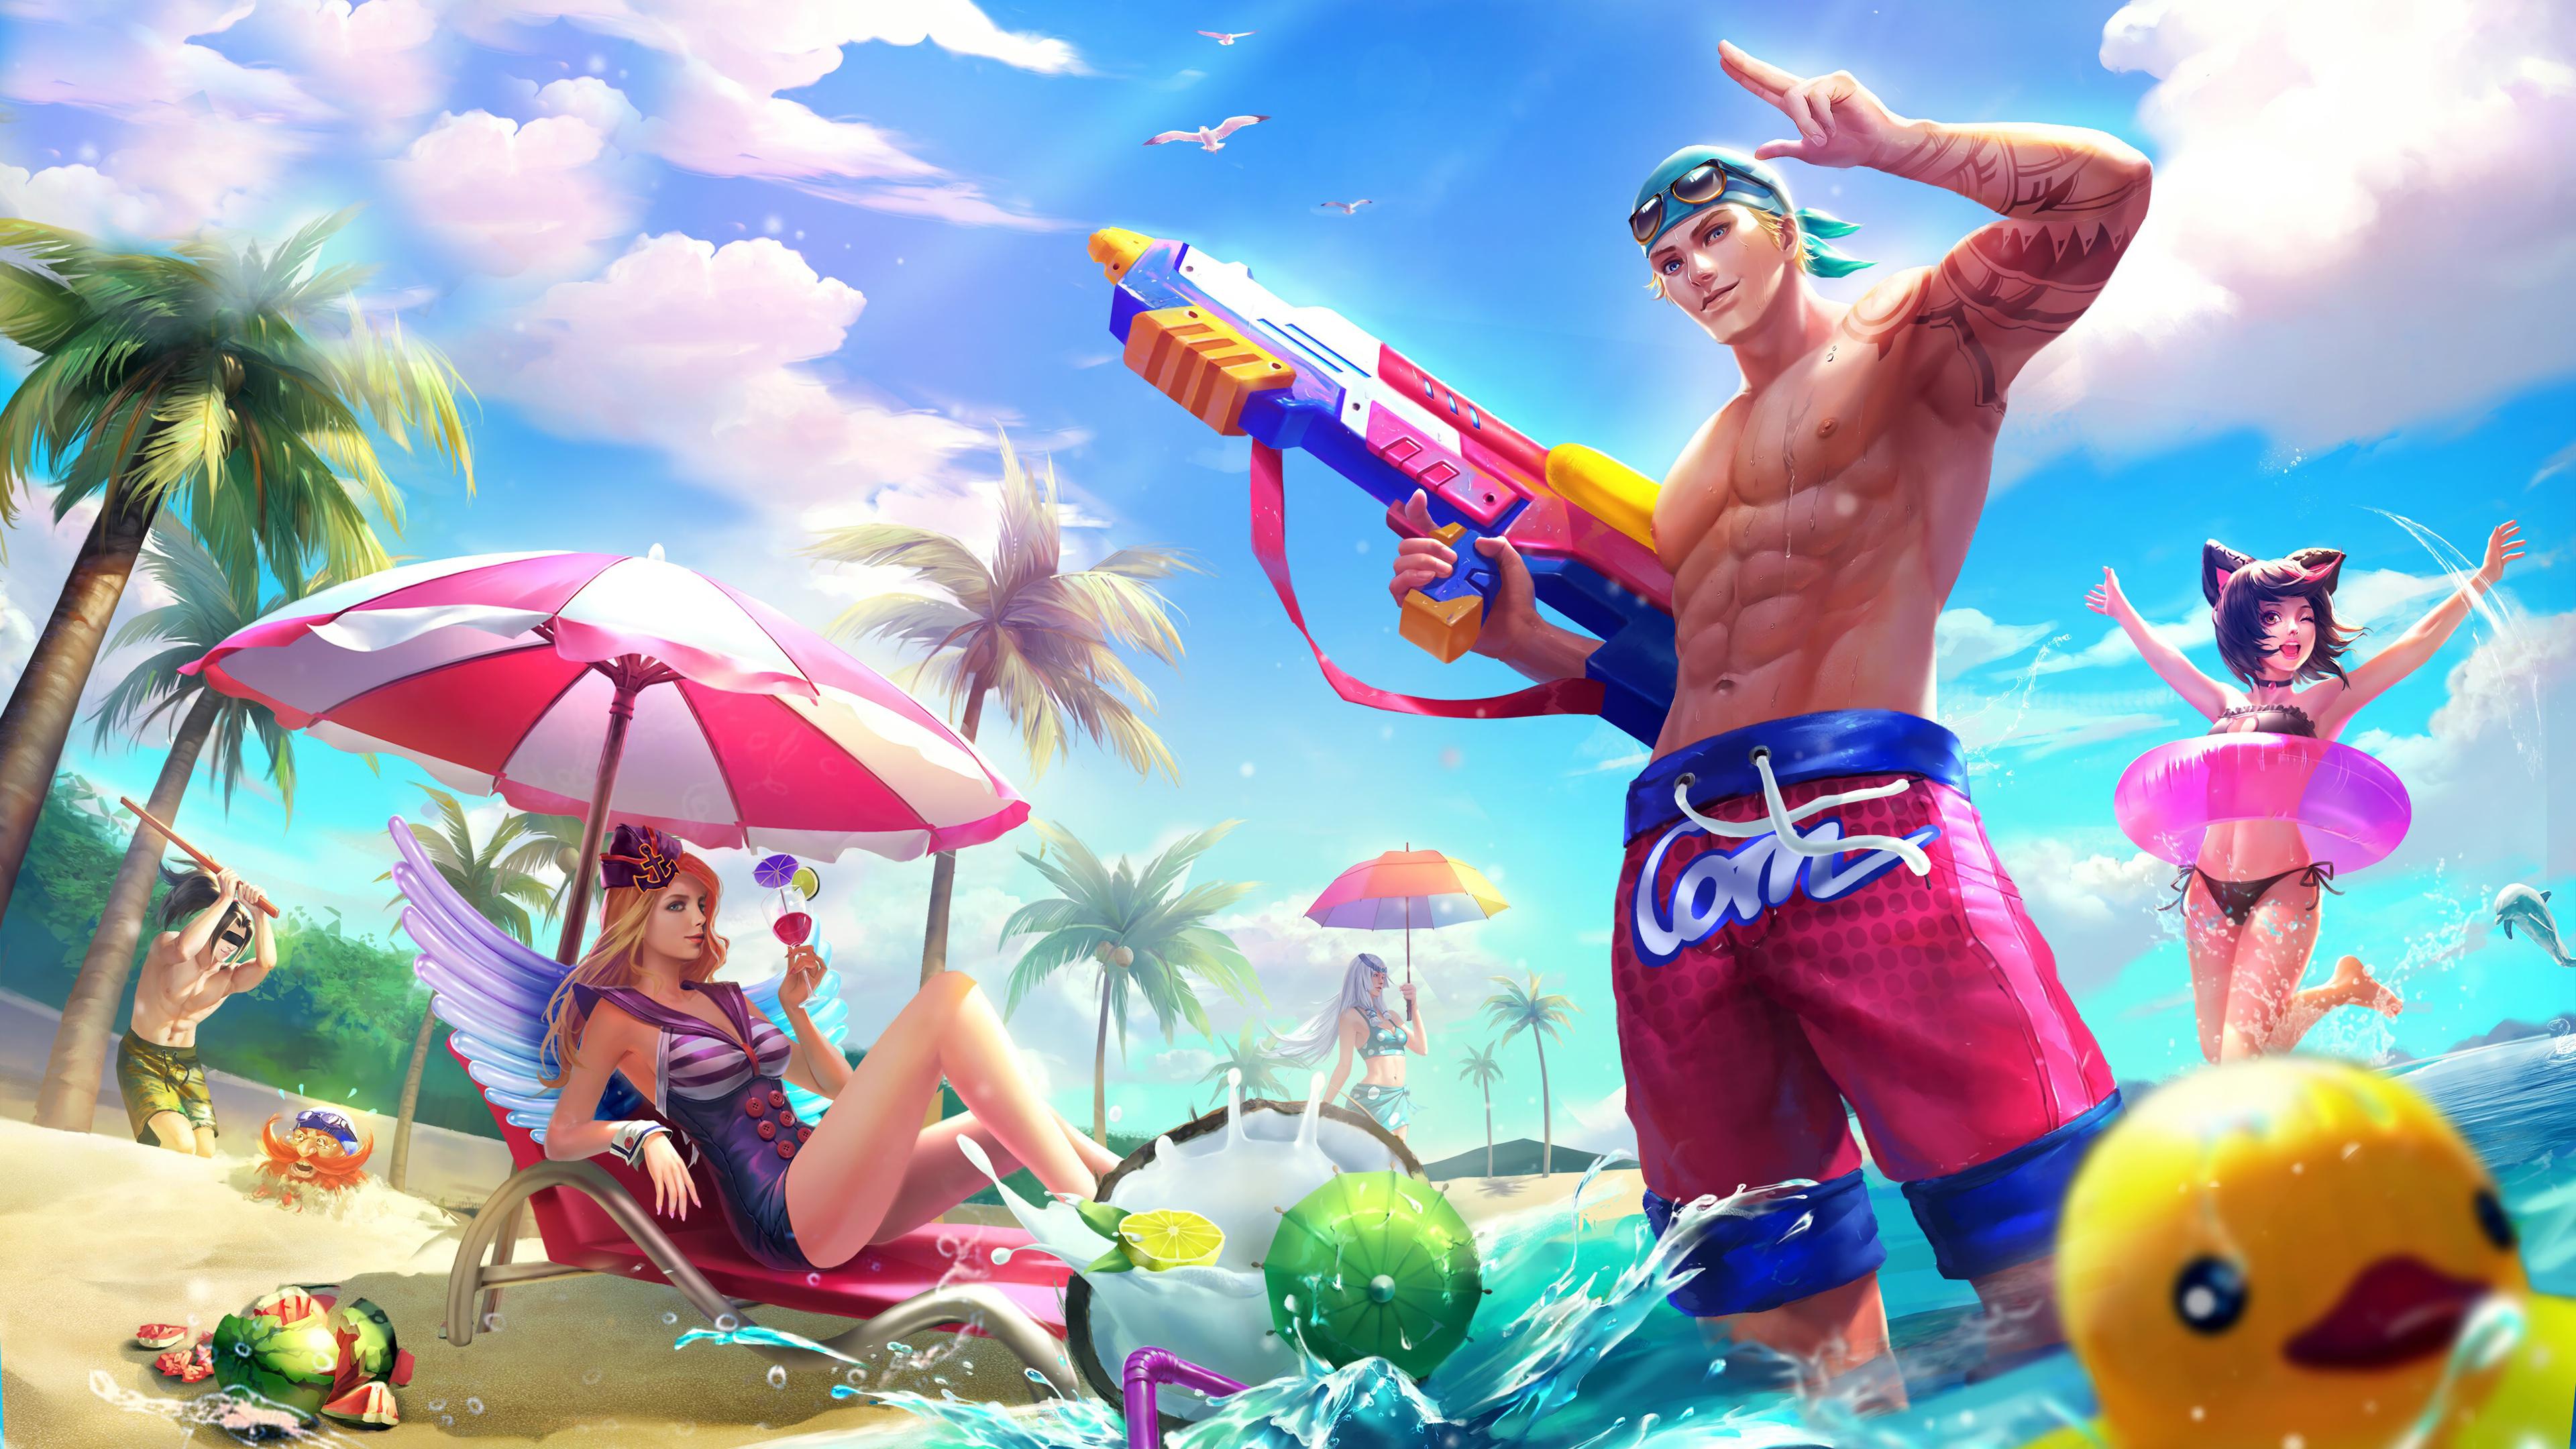 Clint Sun N Sand Freya Beach Sweetheart Summer Skins Mobile